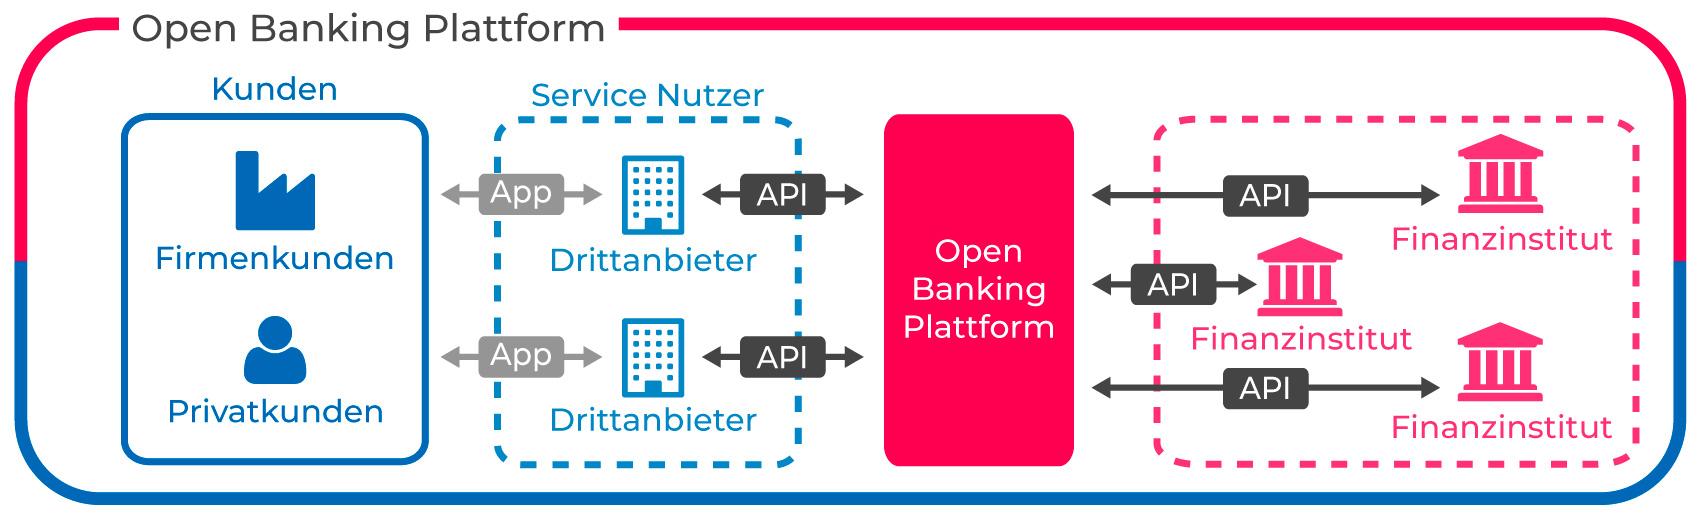 360excellence – Open Banking Plattform